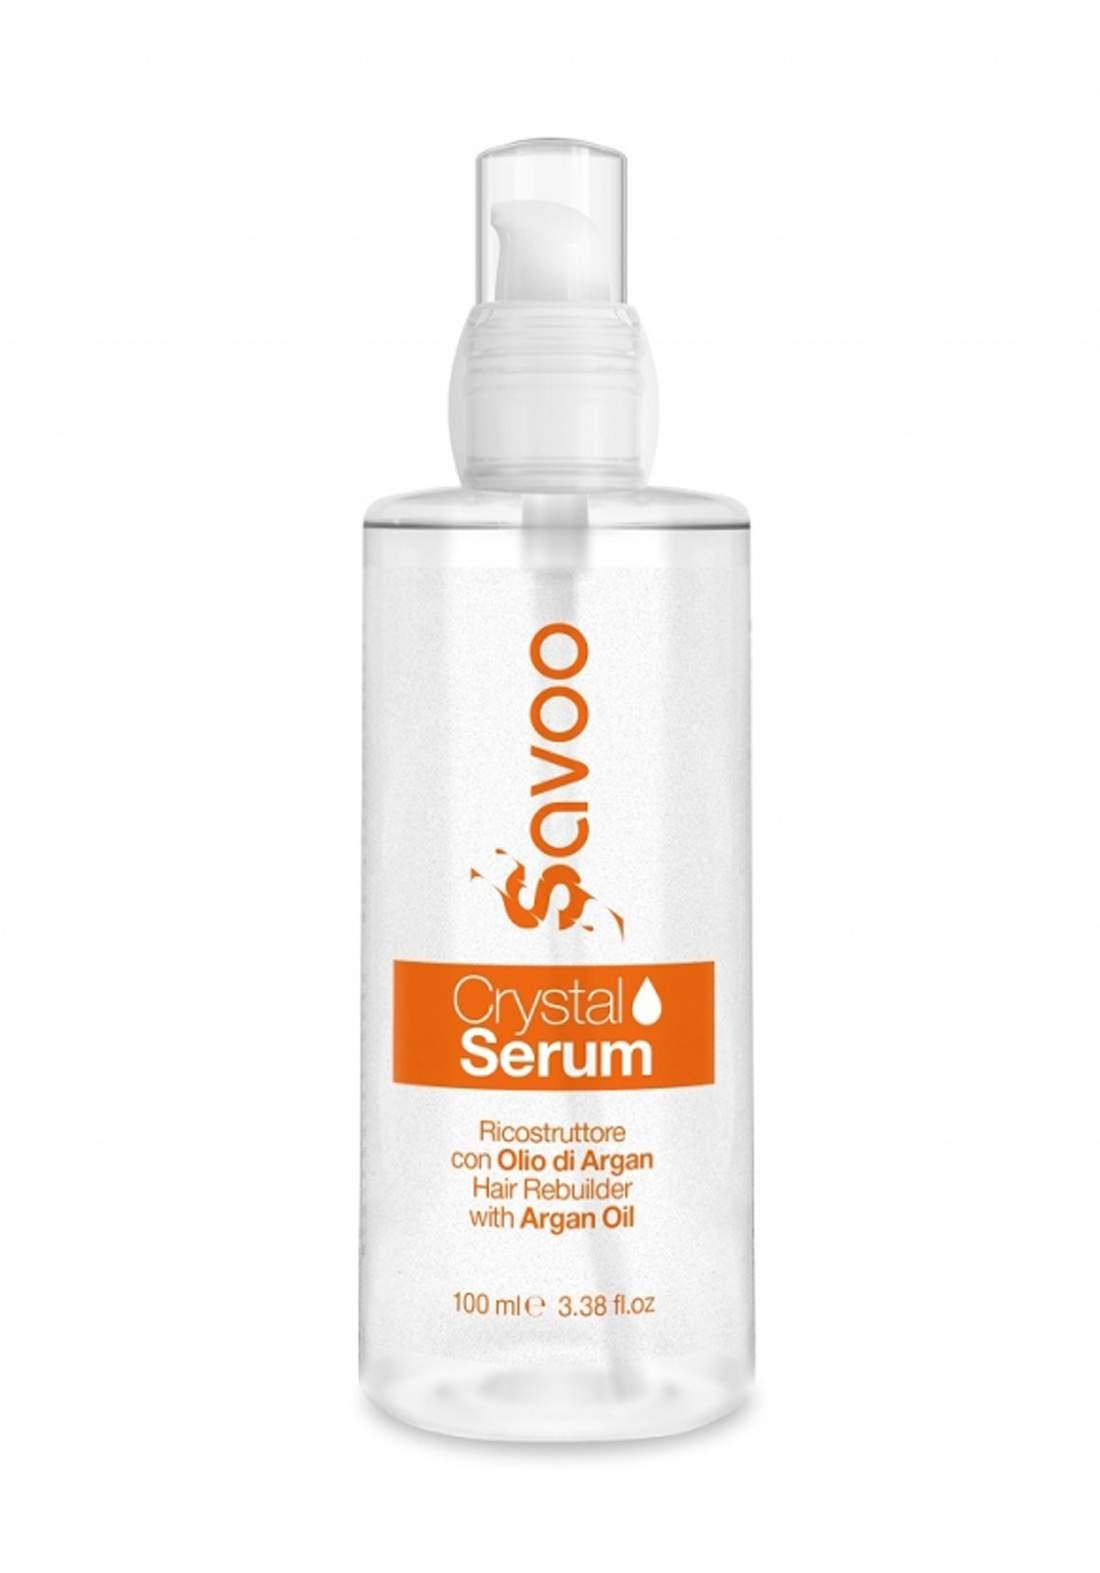 Savoo Crystal Serum Ricostruttore for Hair 100ml سيرم للشعر